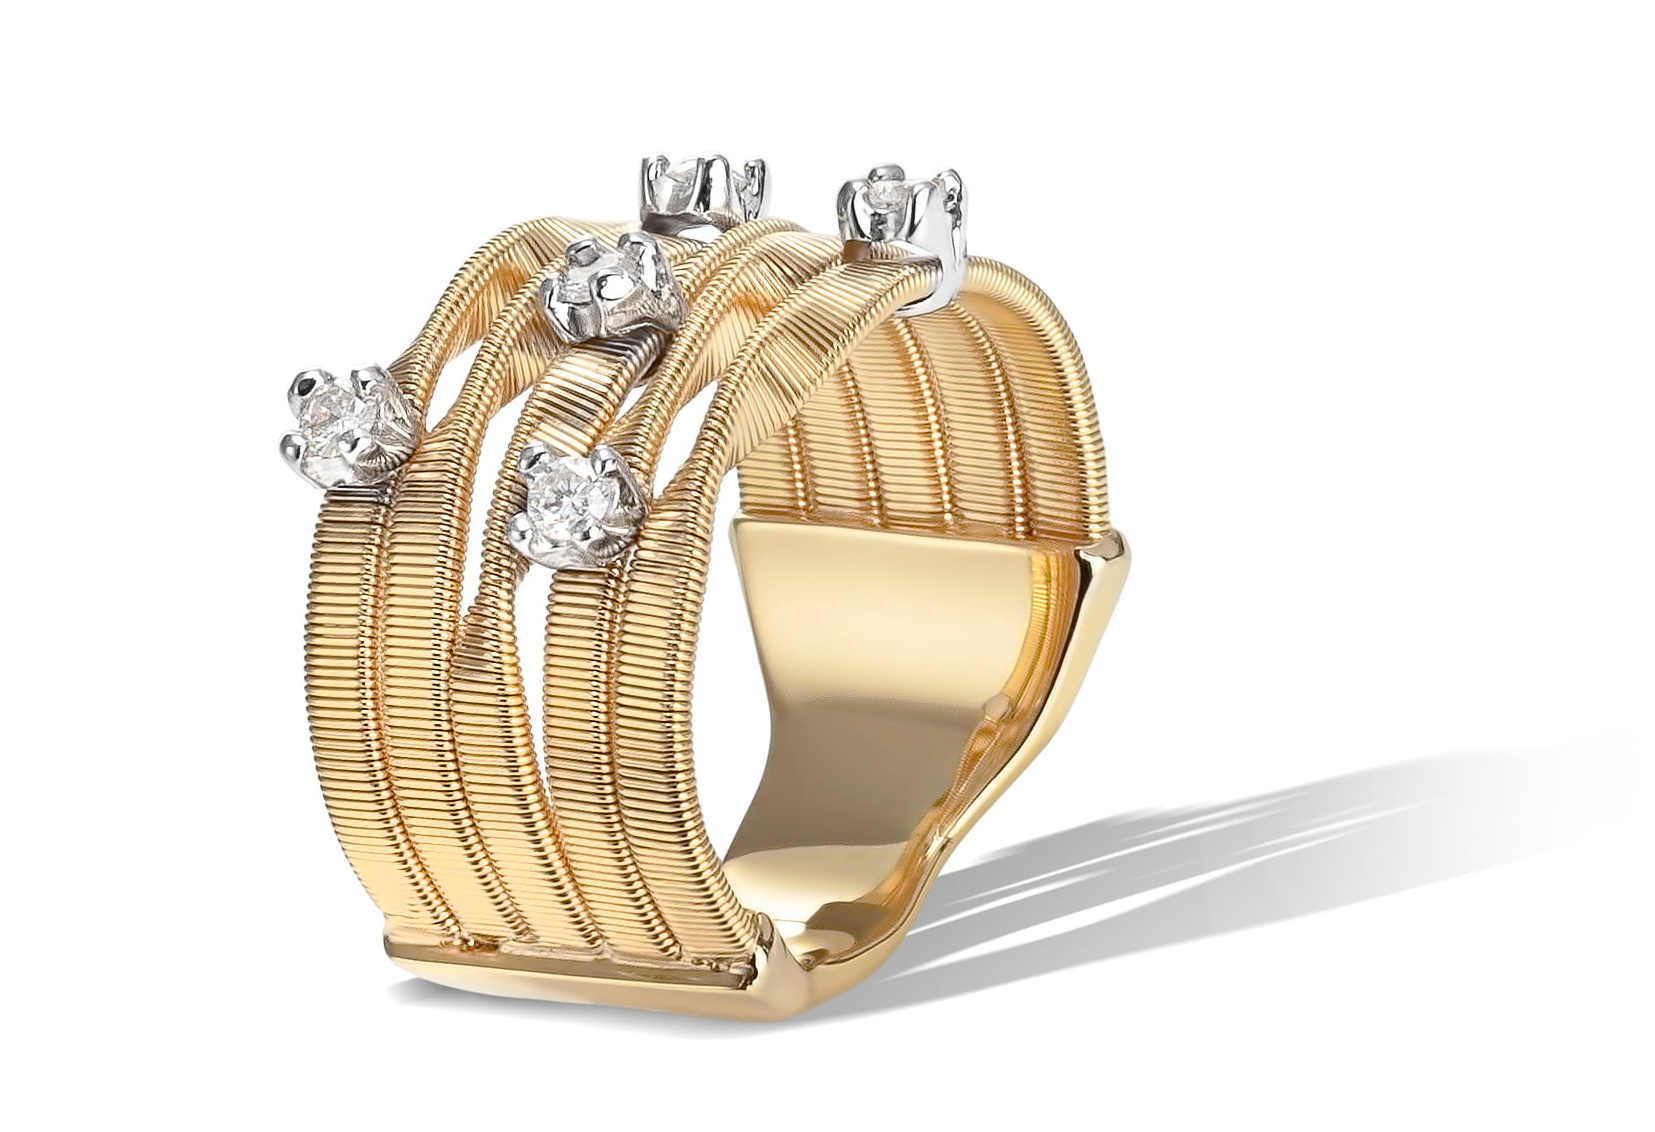 18 karaat geelgouden dames ring - Marco Bicego - Marrakech-3